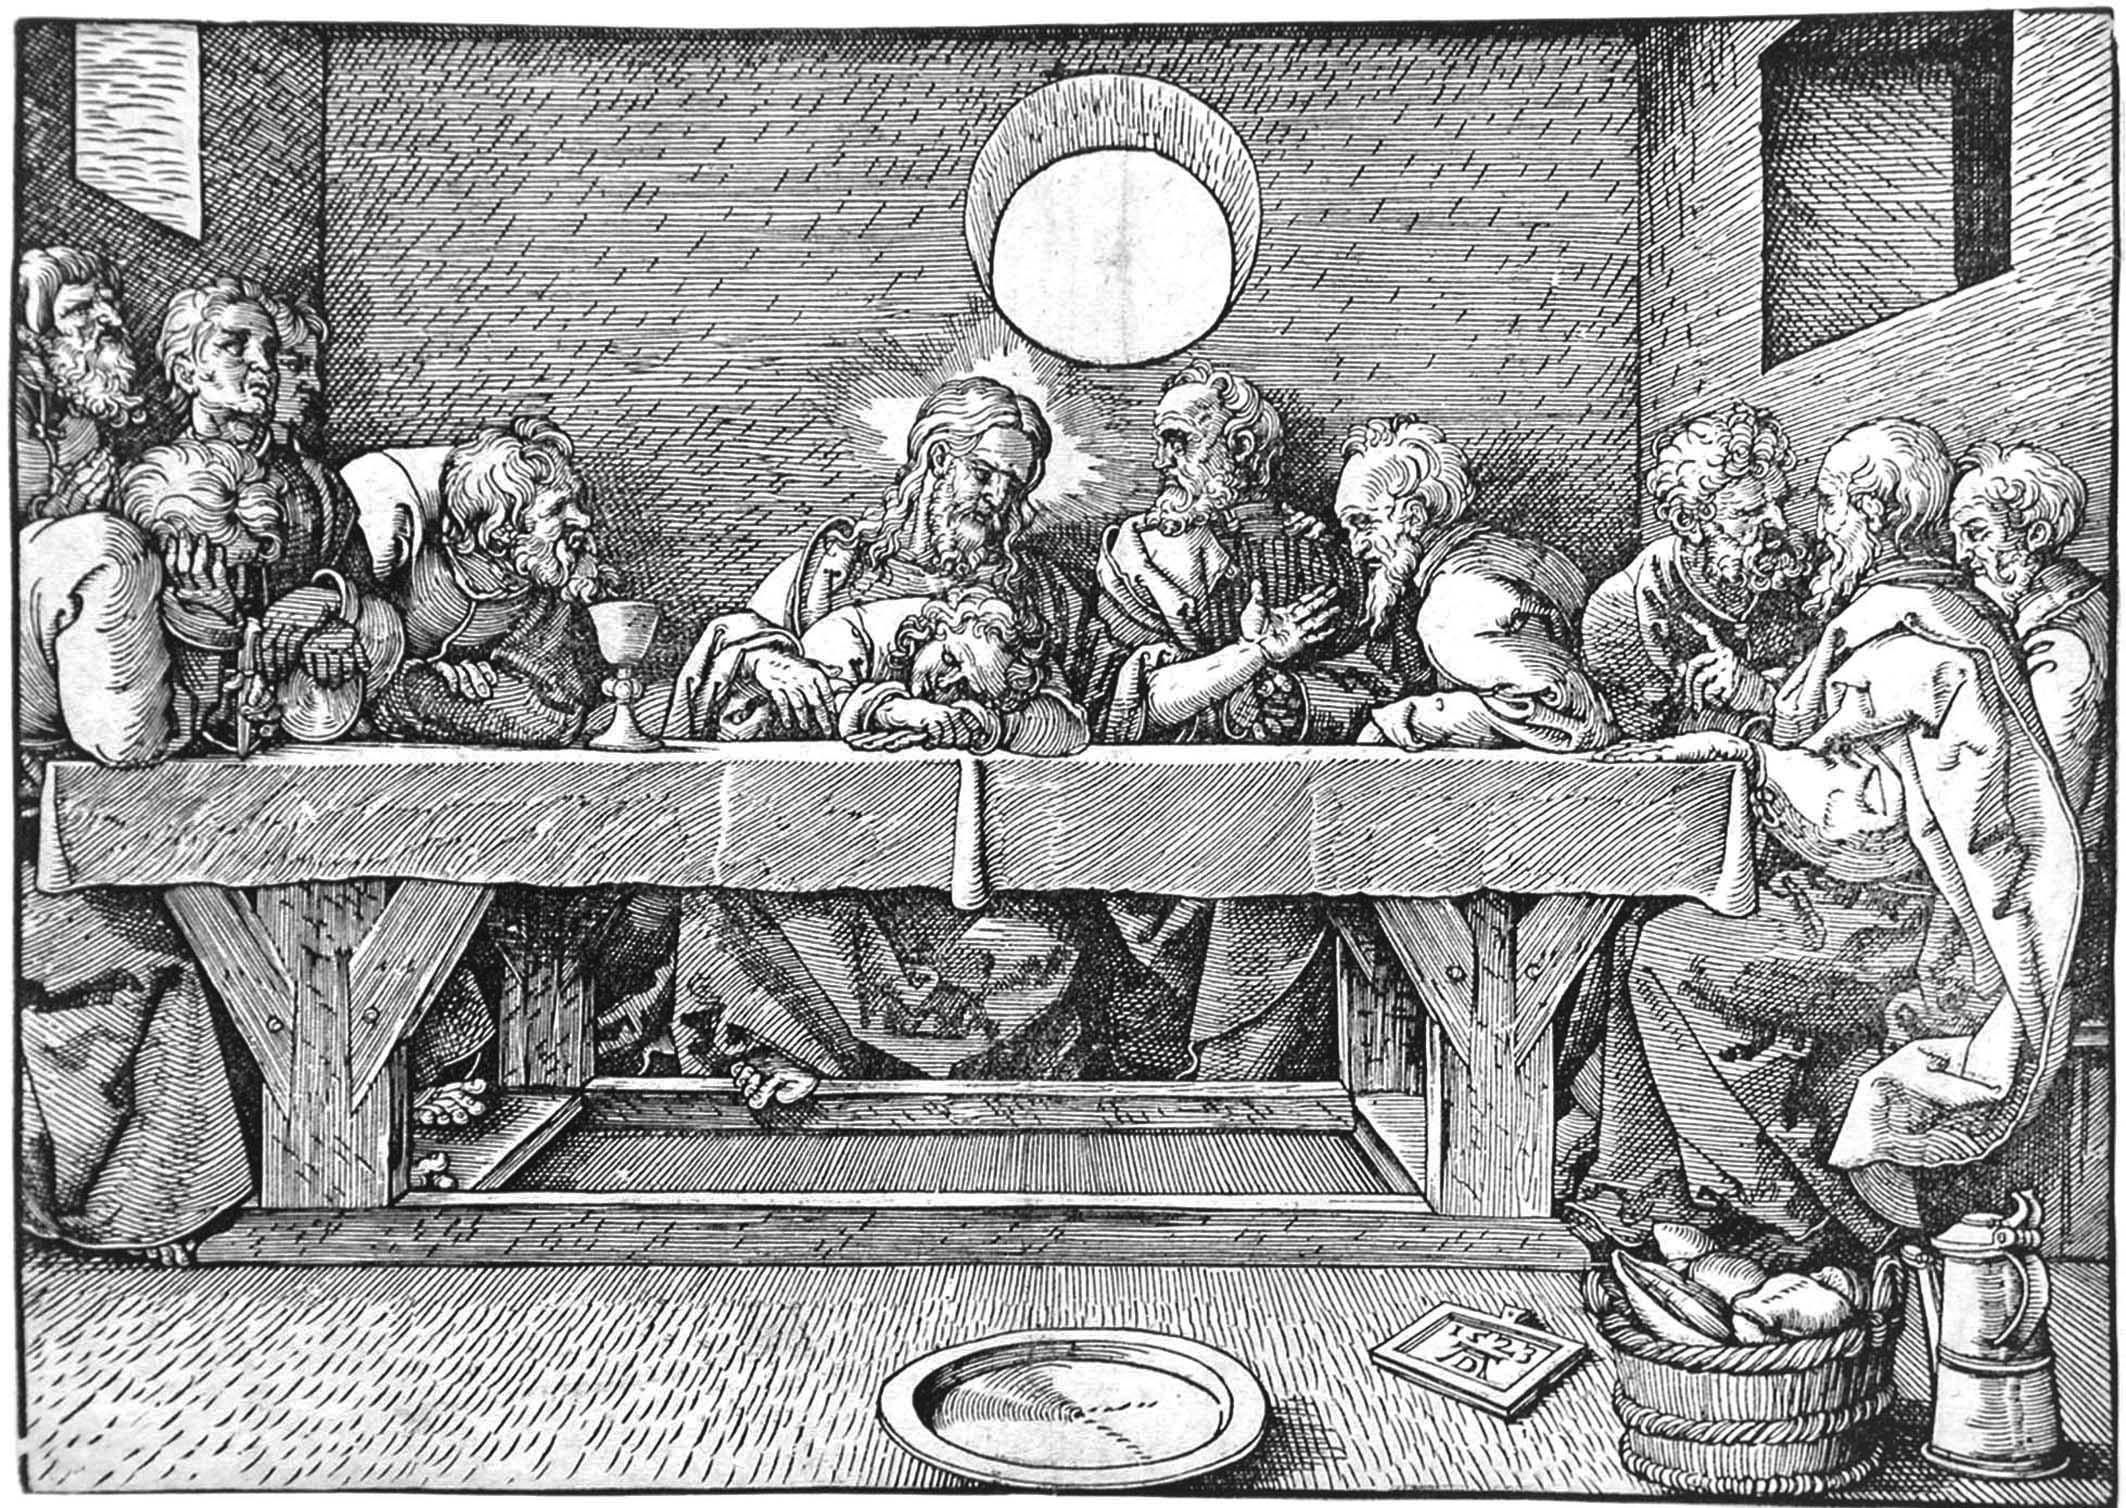 Scuola di A. Durer; Ultima cena